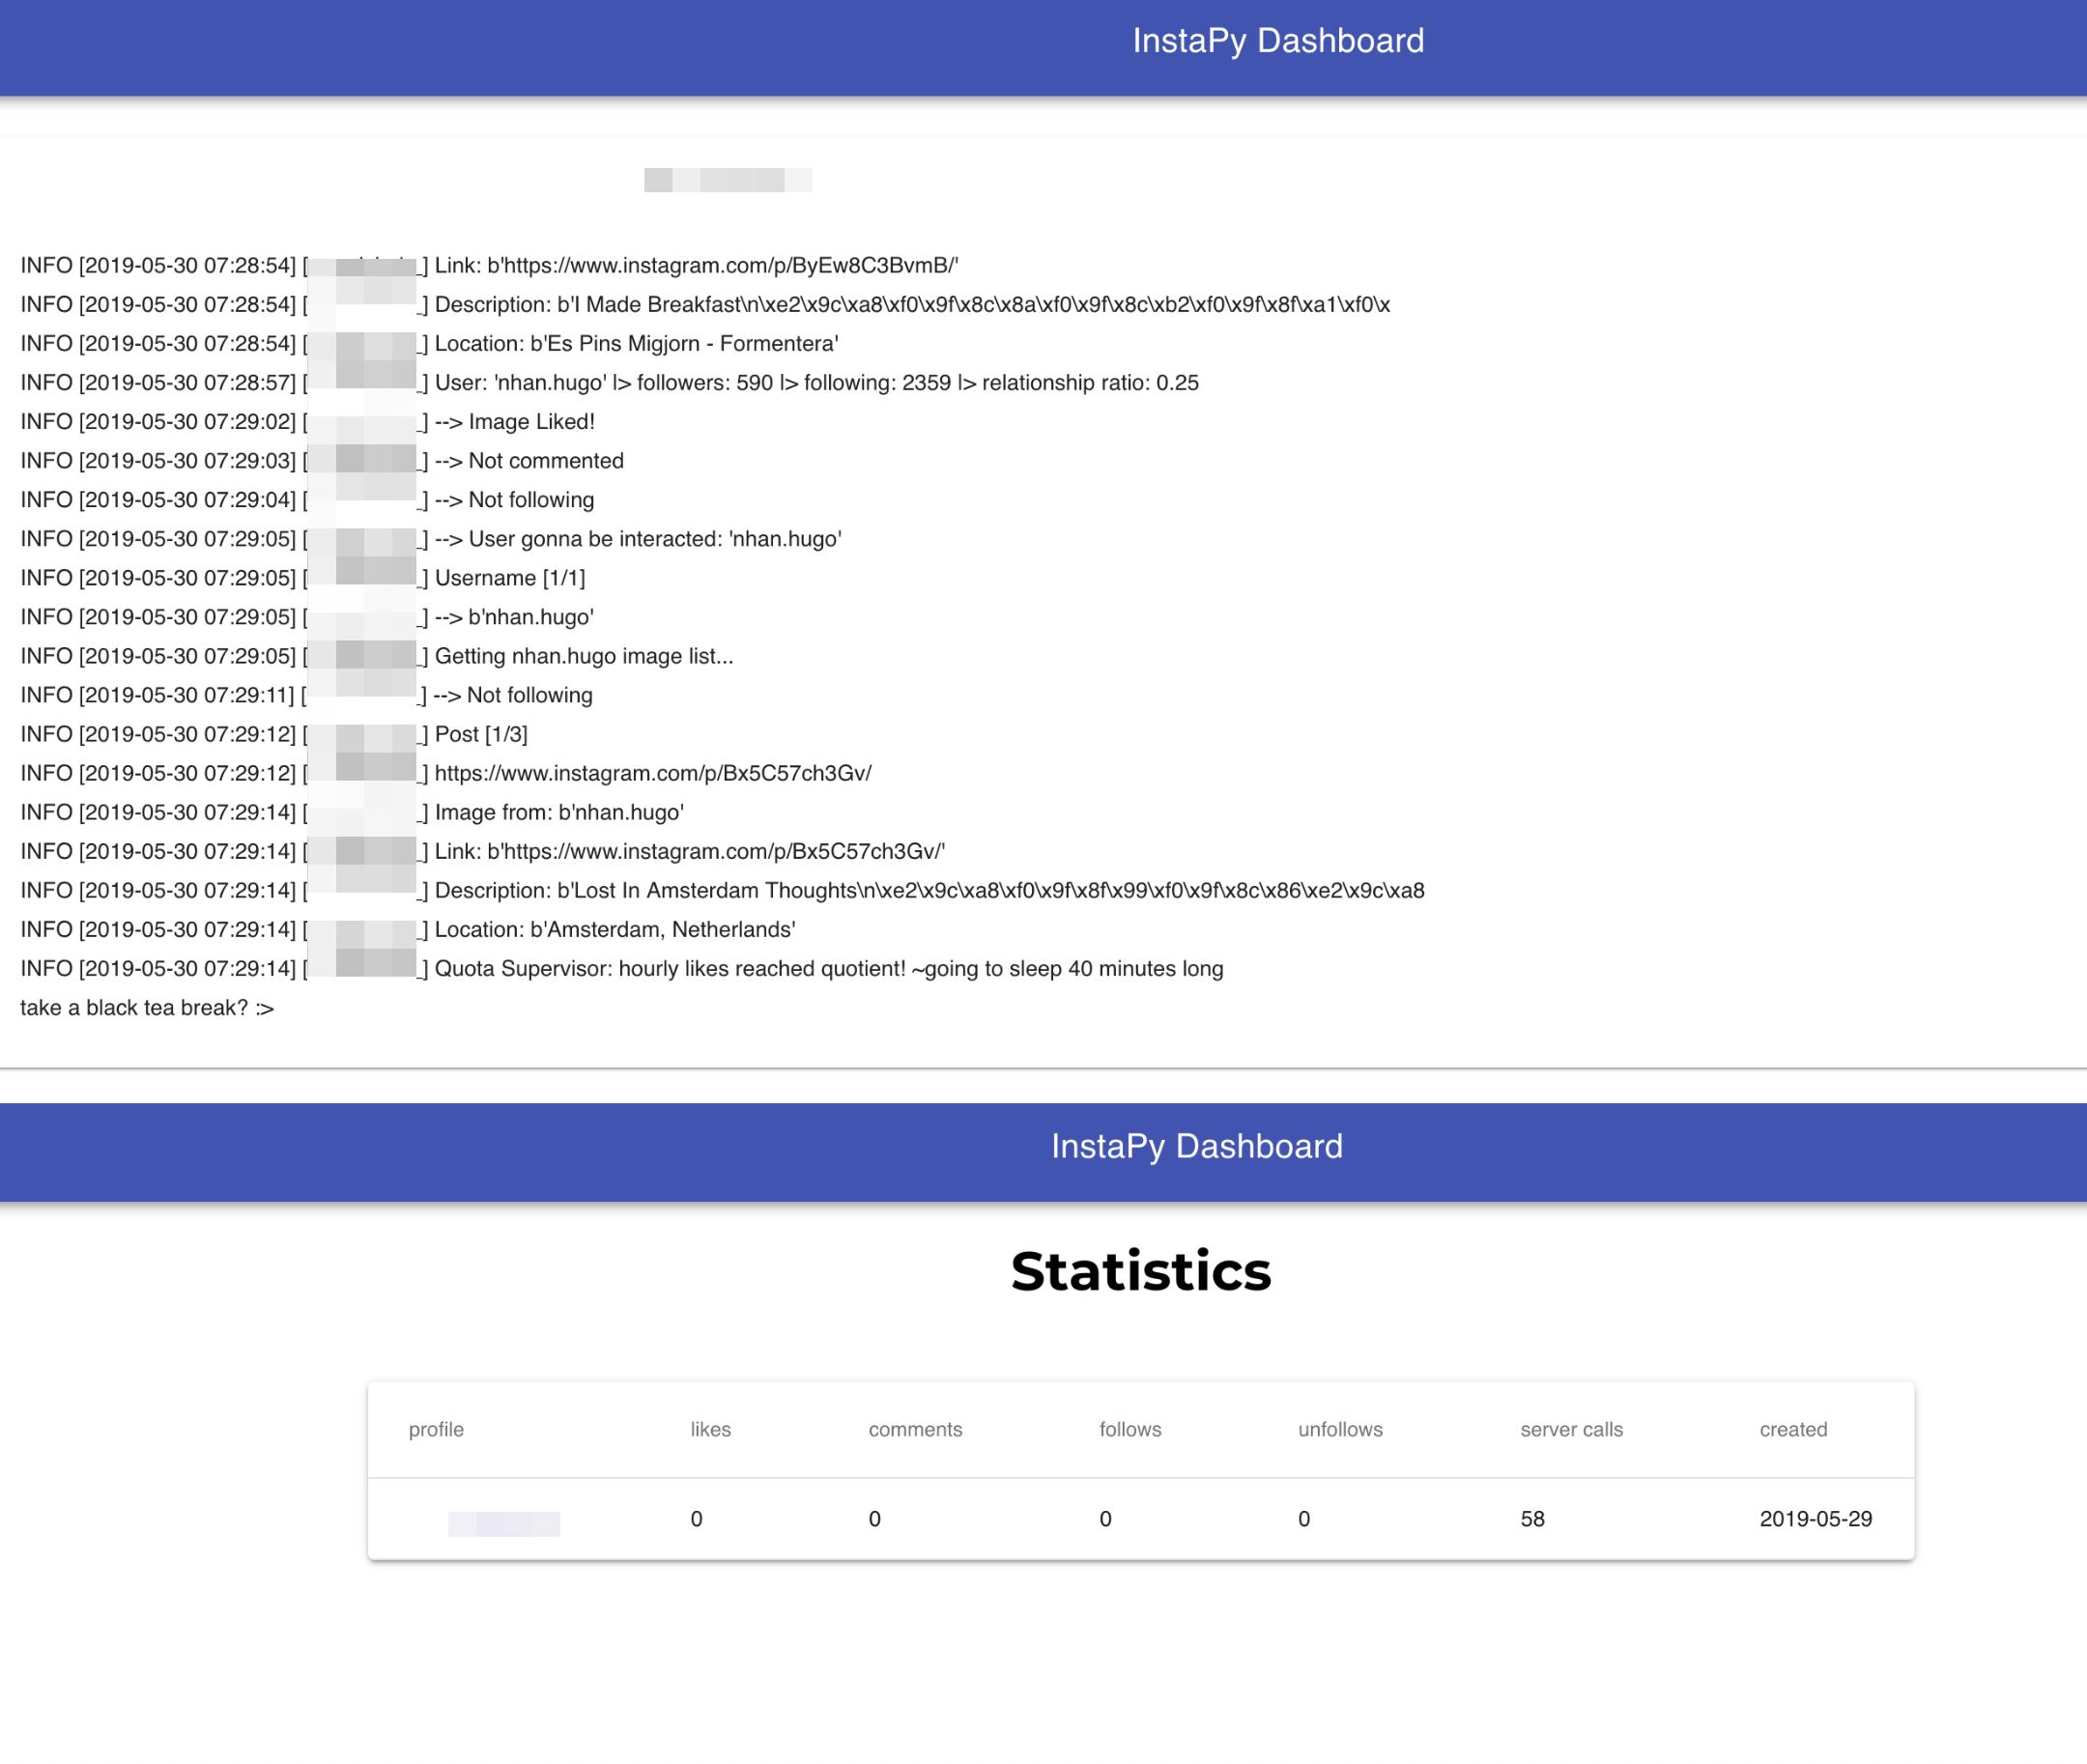 instapy-dashboard - Bountysource